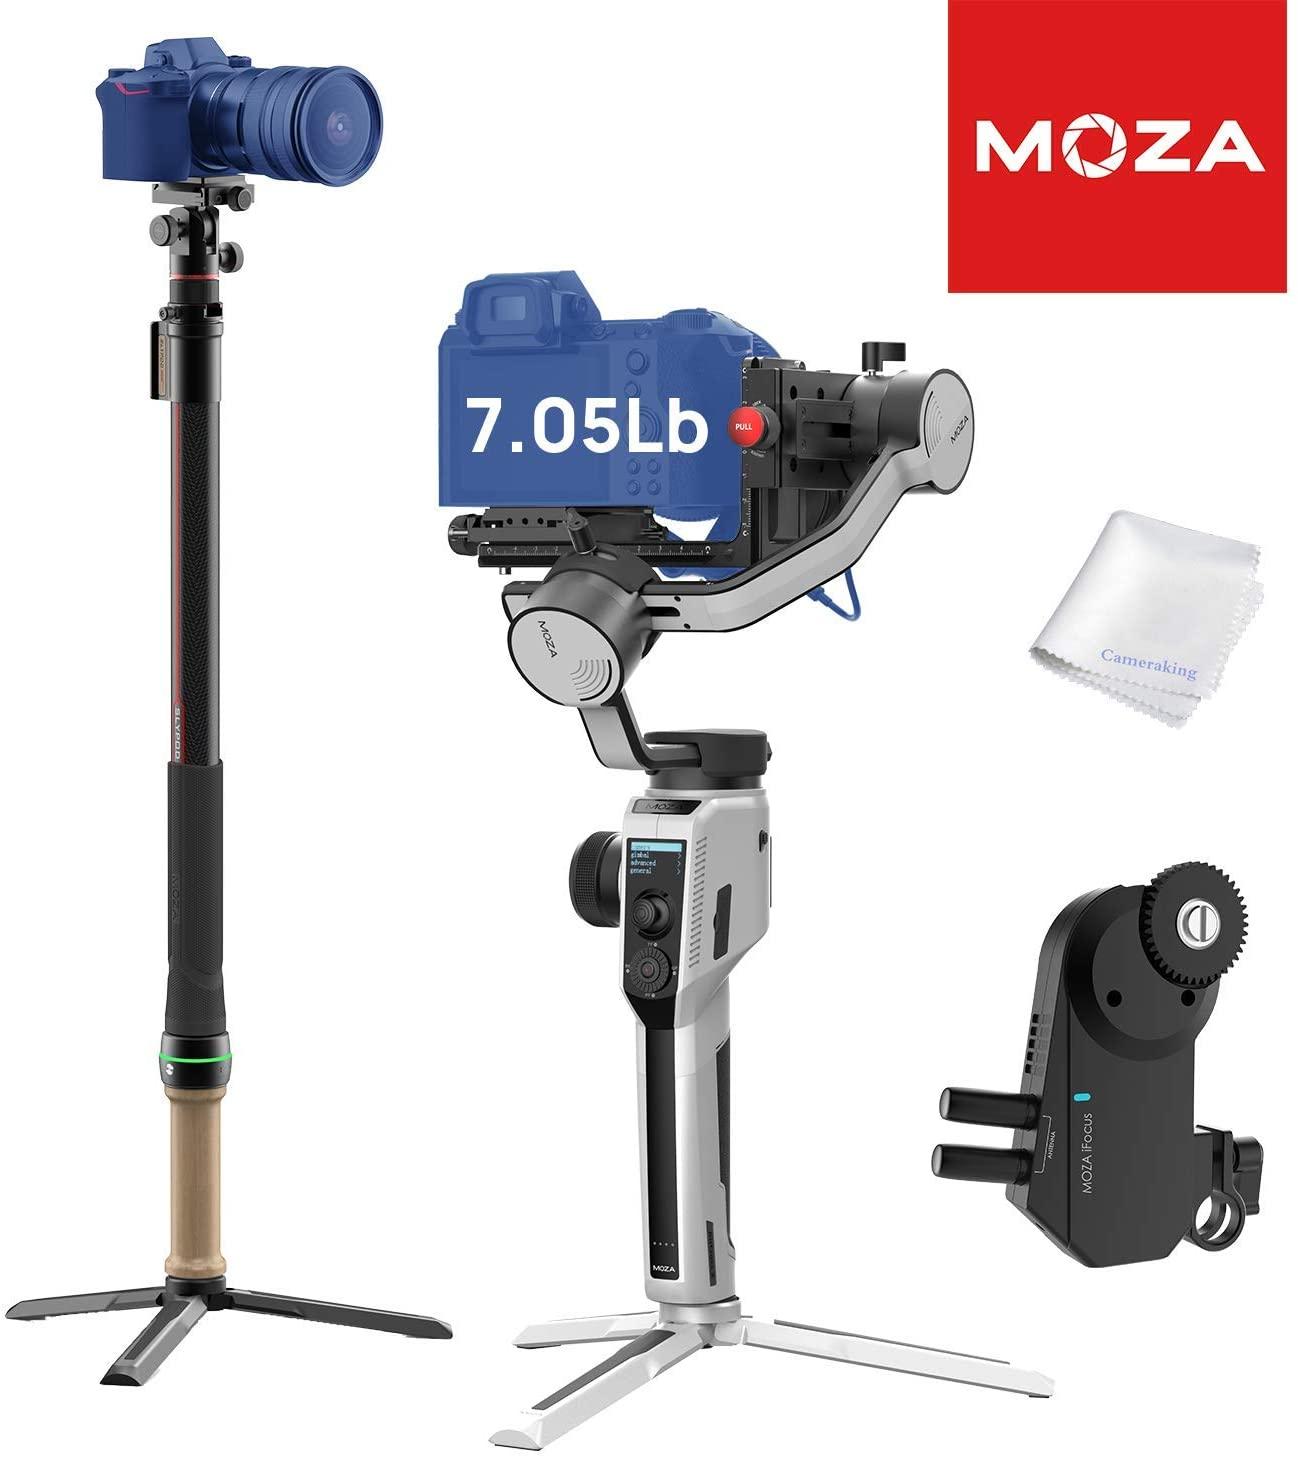 MOZA AirCross 2 Gimbal White + MOZA Slypod Motion Slider + iFocus Motor Professional Kit